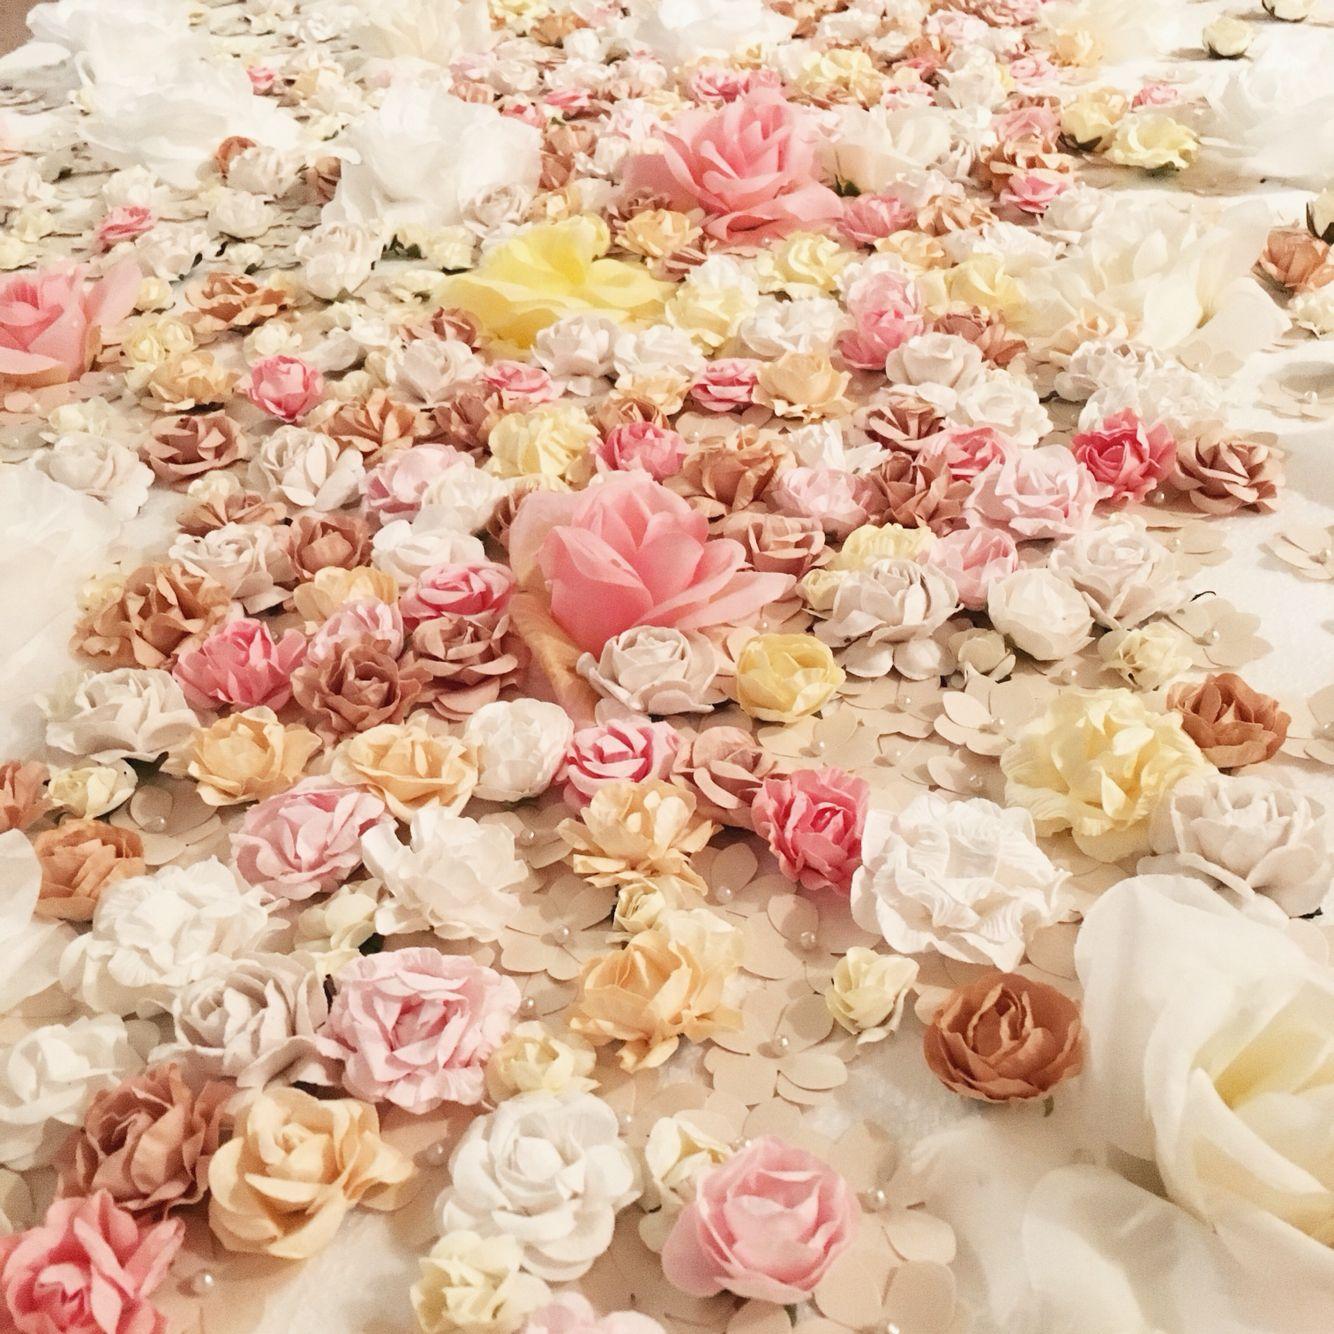 Diy Wall Flowers: DIY Flower Wall. I Made This Flower Wall Using Styrofoam